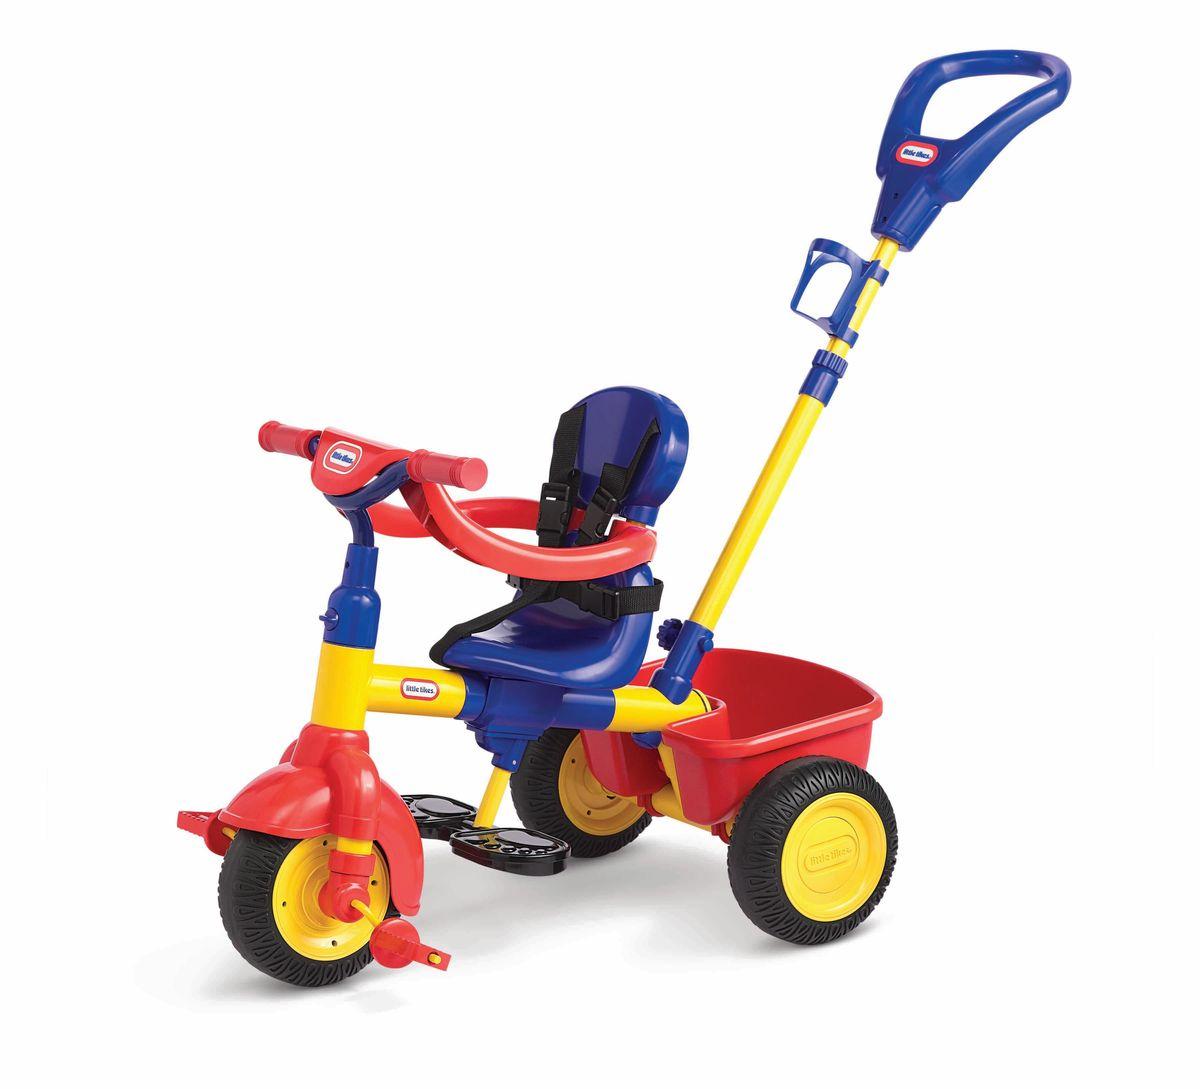 Little Tikes Велосипед детский детский велосипед для мальчиков little tikes 618246